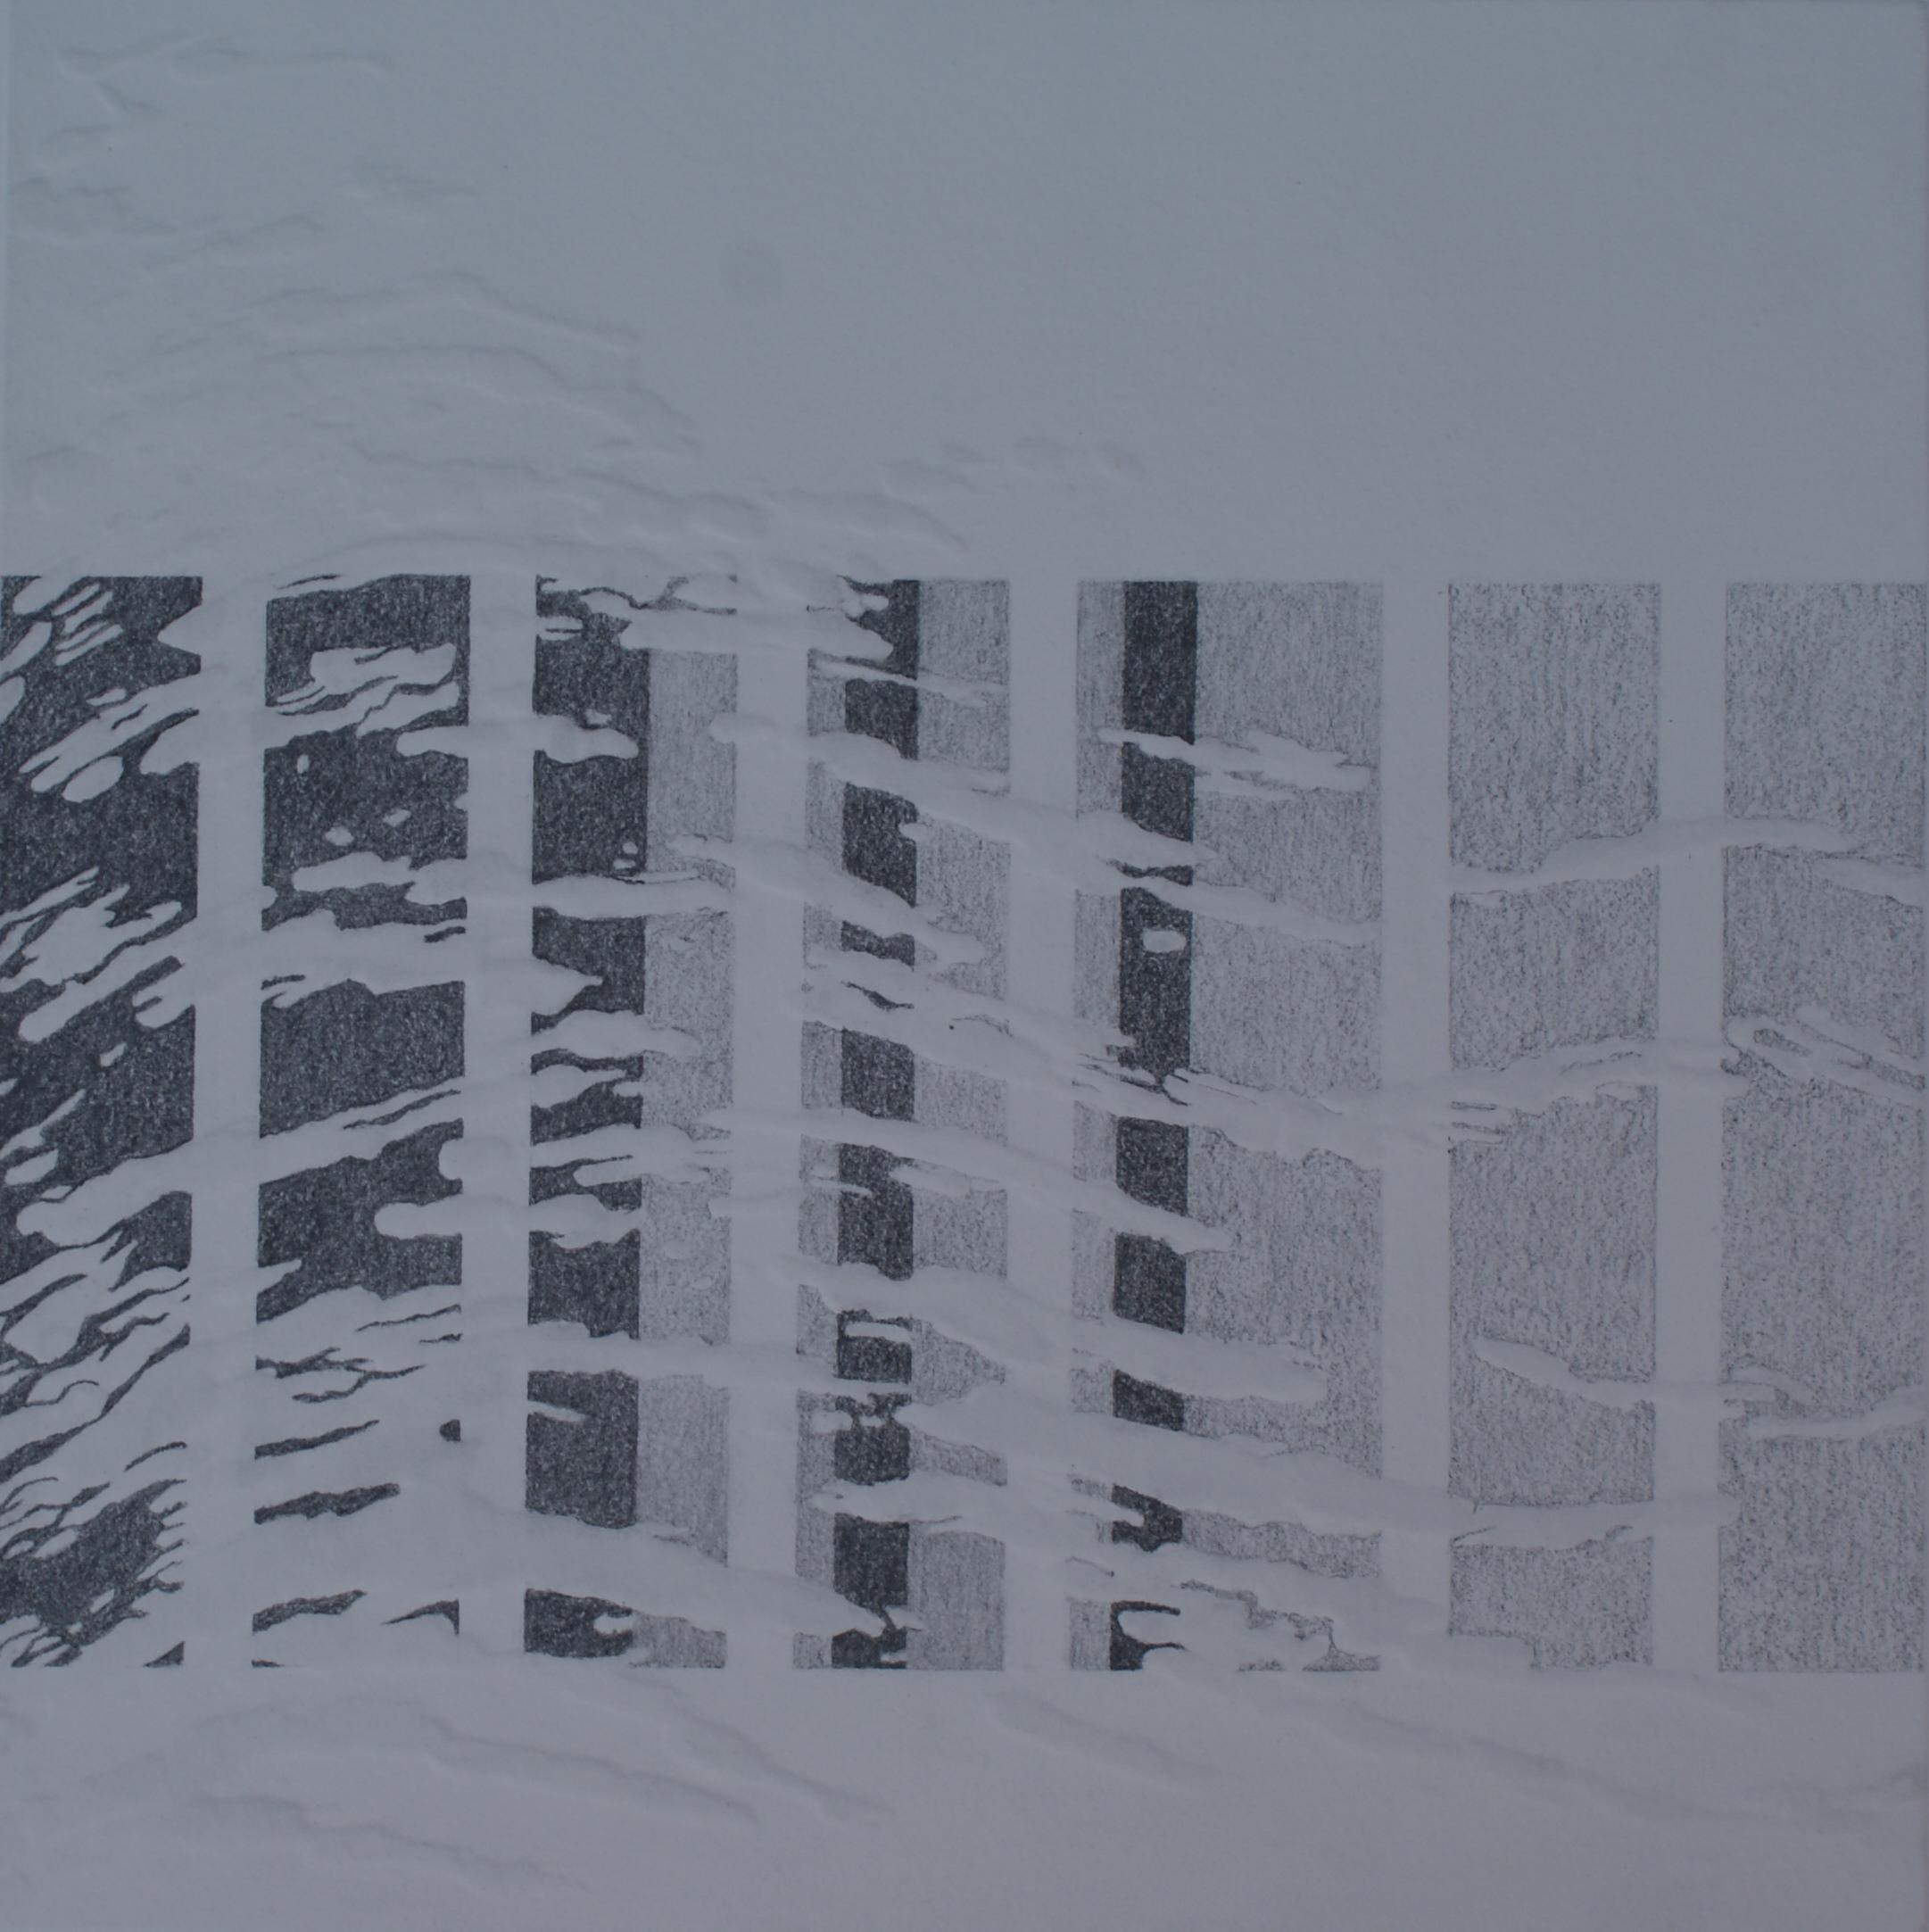 Paalhoofden I, 2016 (blinddruk, potlood) 30 cm x 30 cm